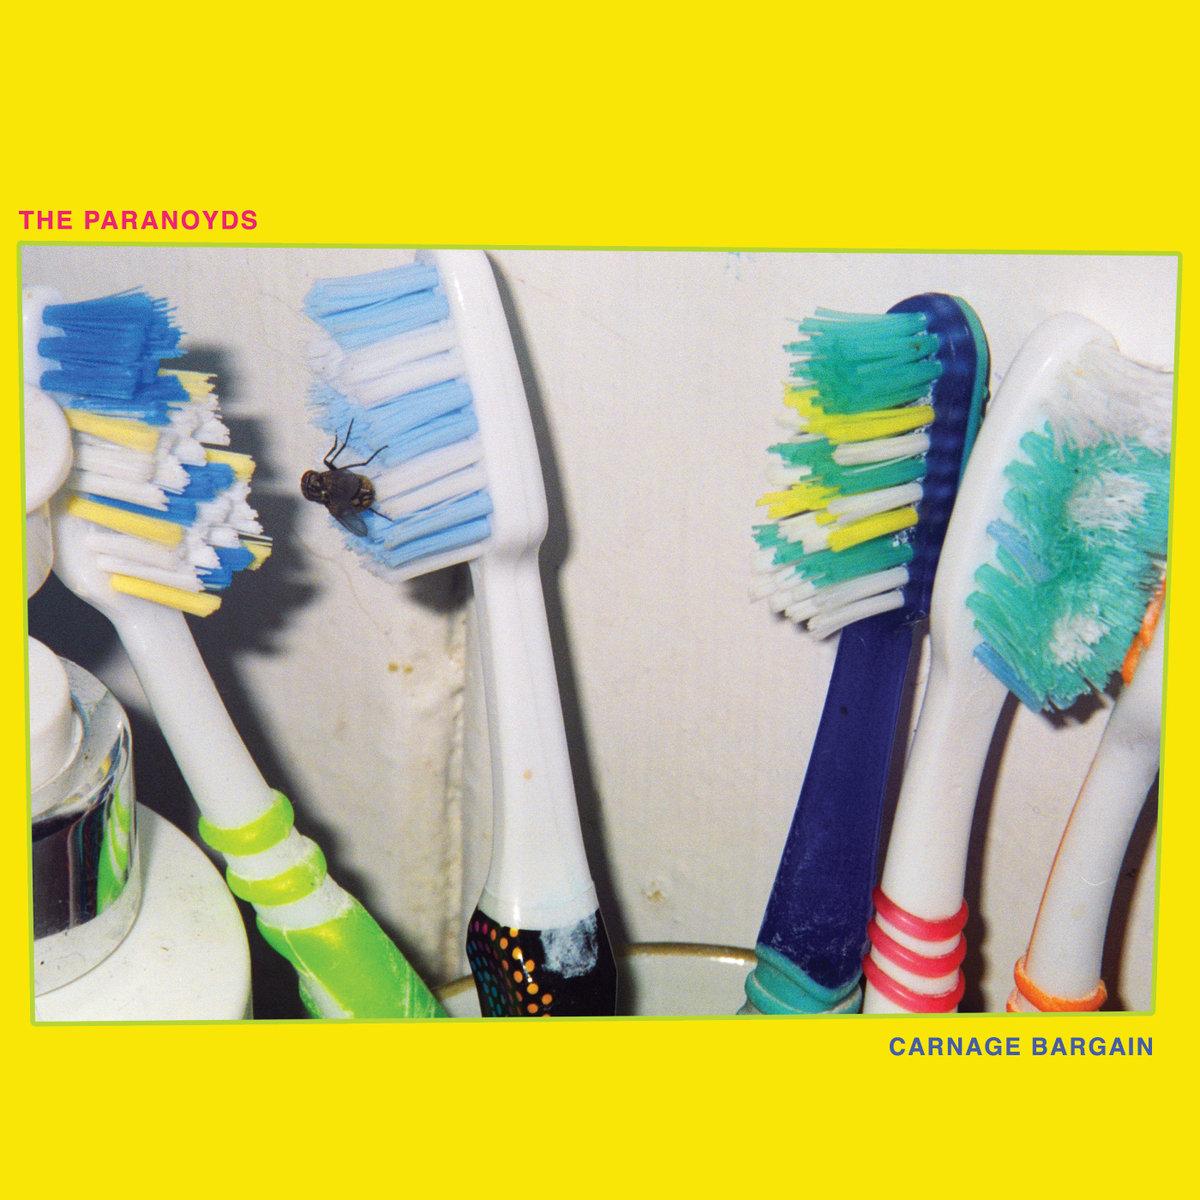 The Paranoyds-Carnage Bargain-Maya Eslami.jpg